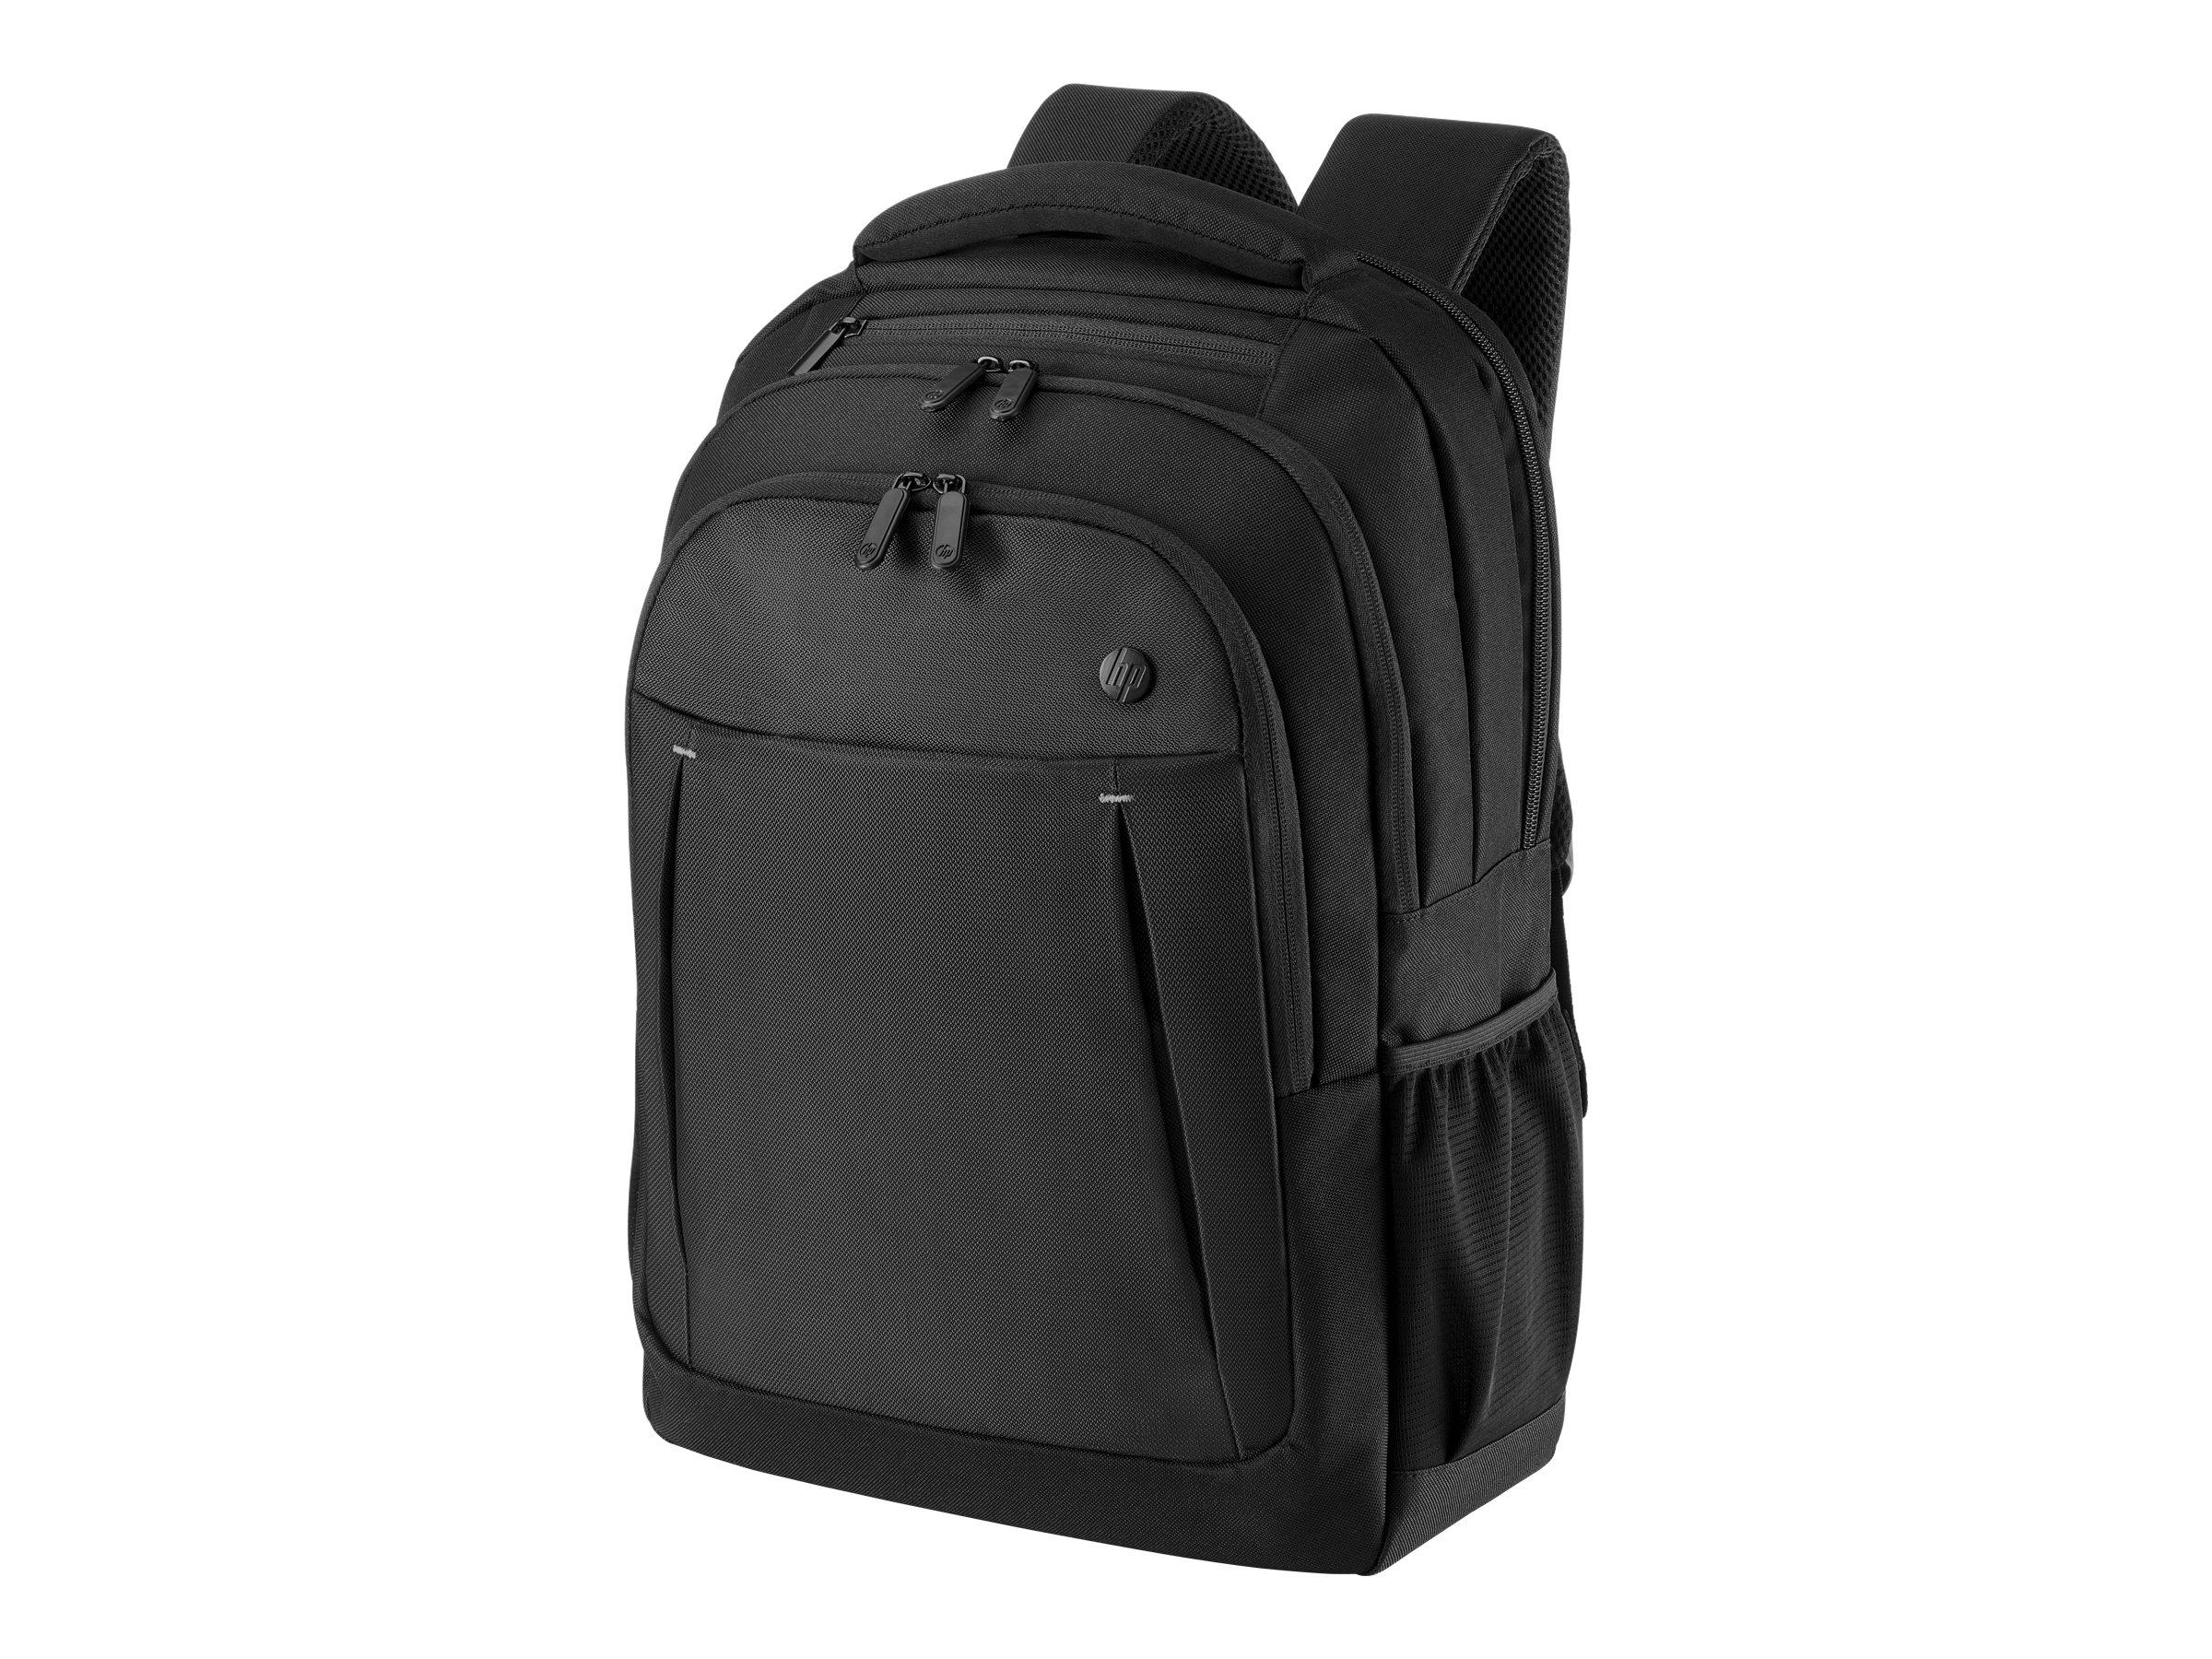 Hp business backpack notebook rucksack 43 9 cm 17 3 fuer elite x2 elitebook 735 g6 745 g6 elitebook x360 probook 455r g6 640 g5 650 g5 8233007 2sc67aa